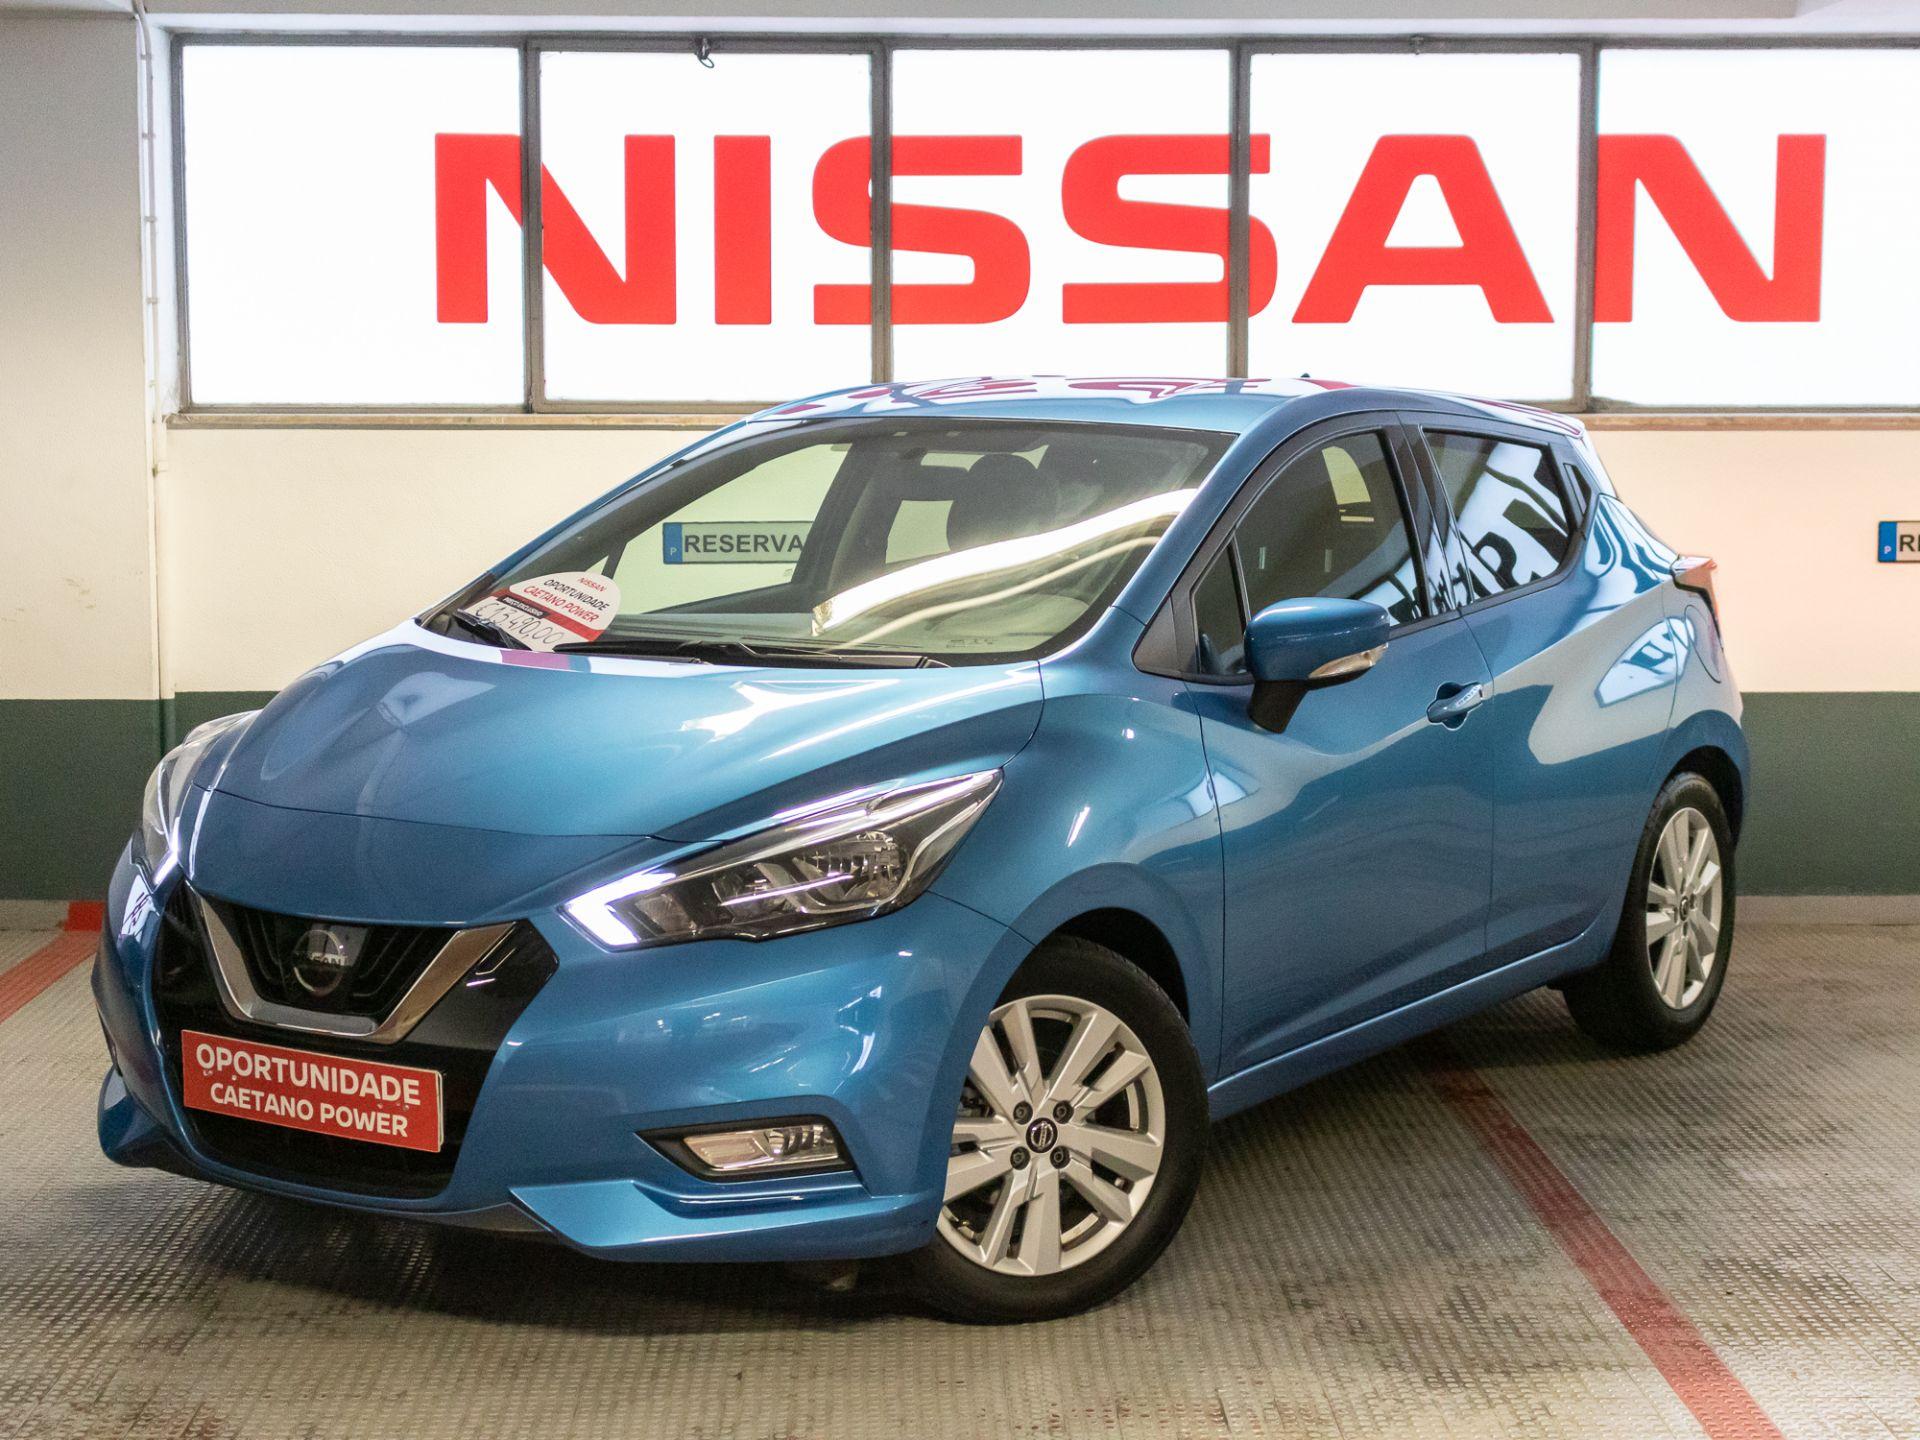 Nissan Micra IG-T 74 kW (100 CV) E6D Acenta Connect segunda mão Lisboa